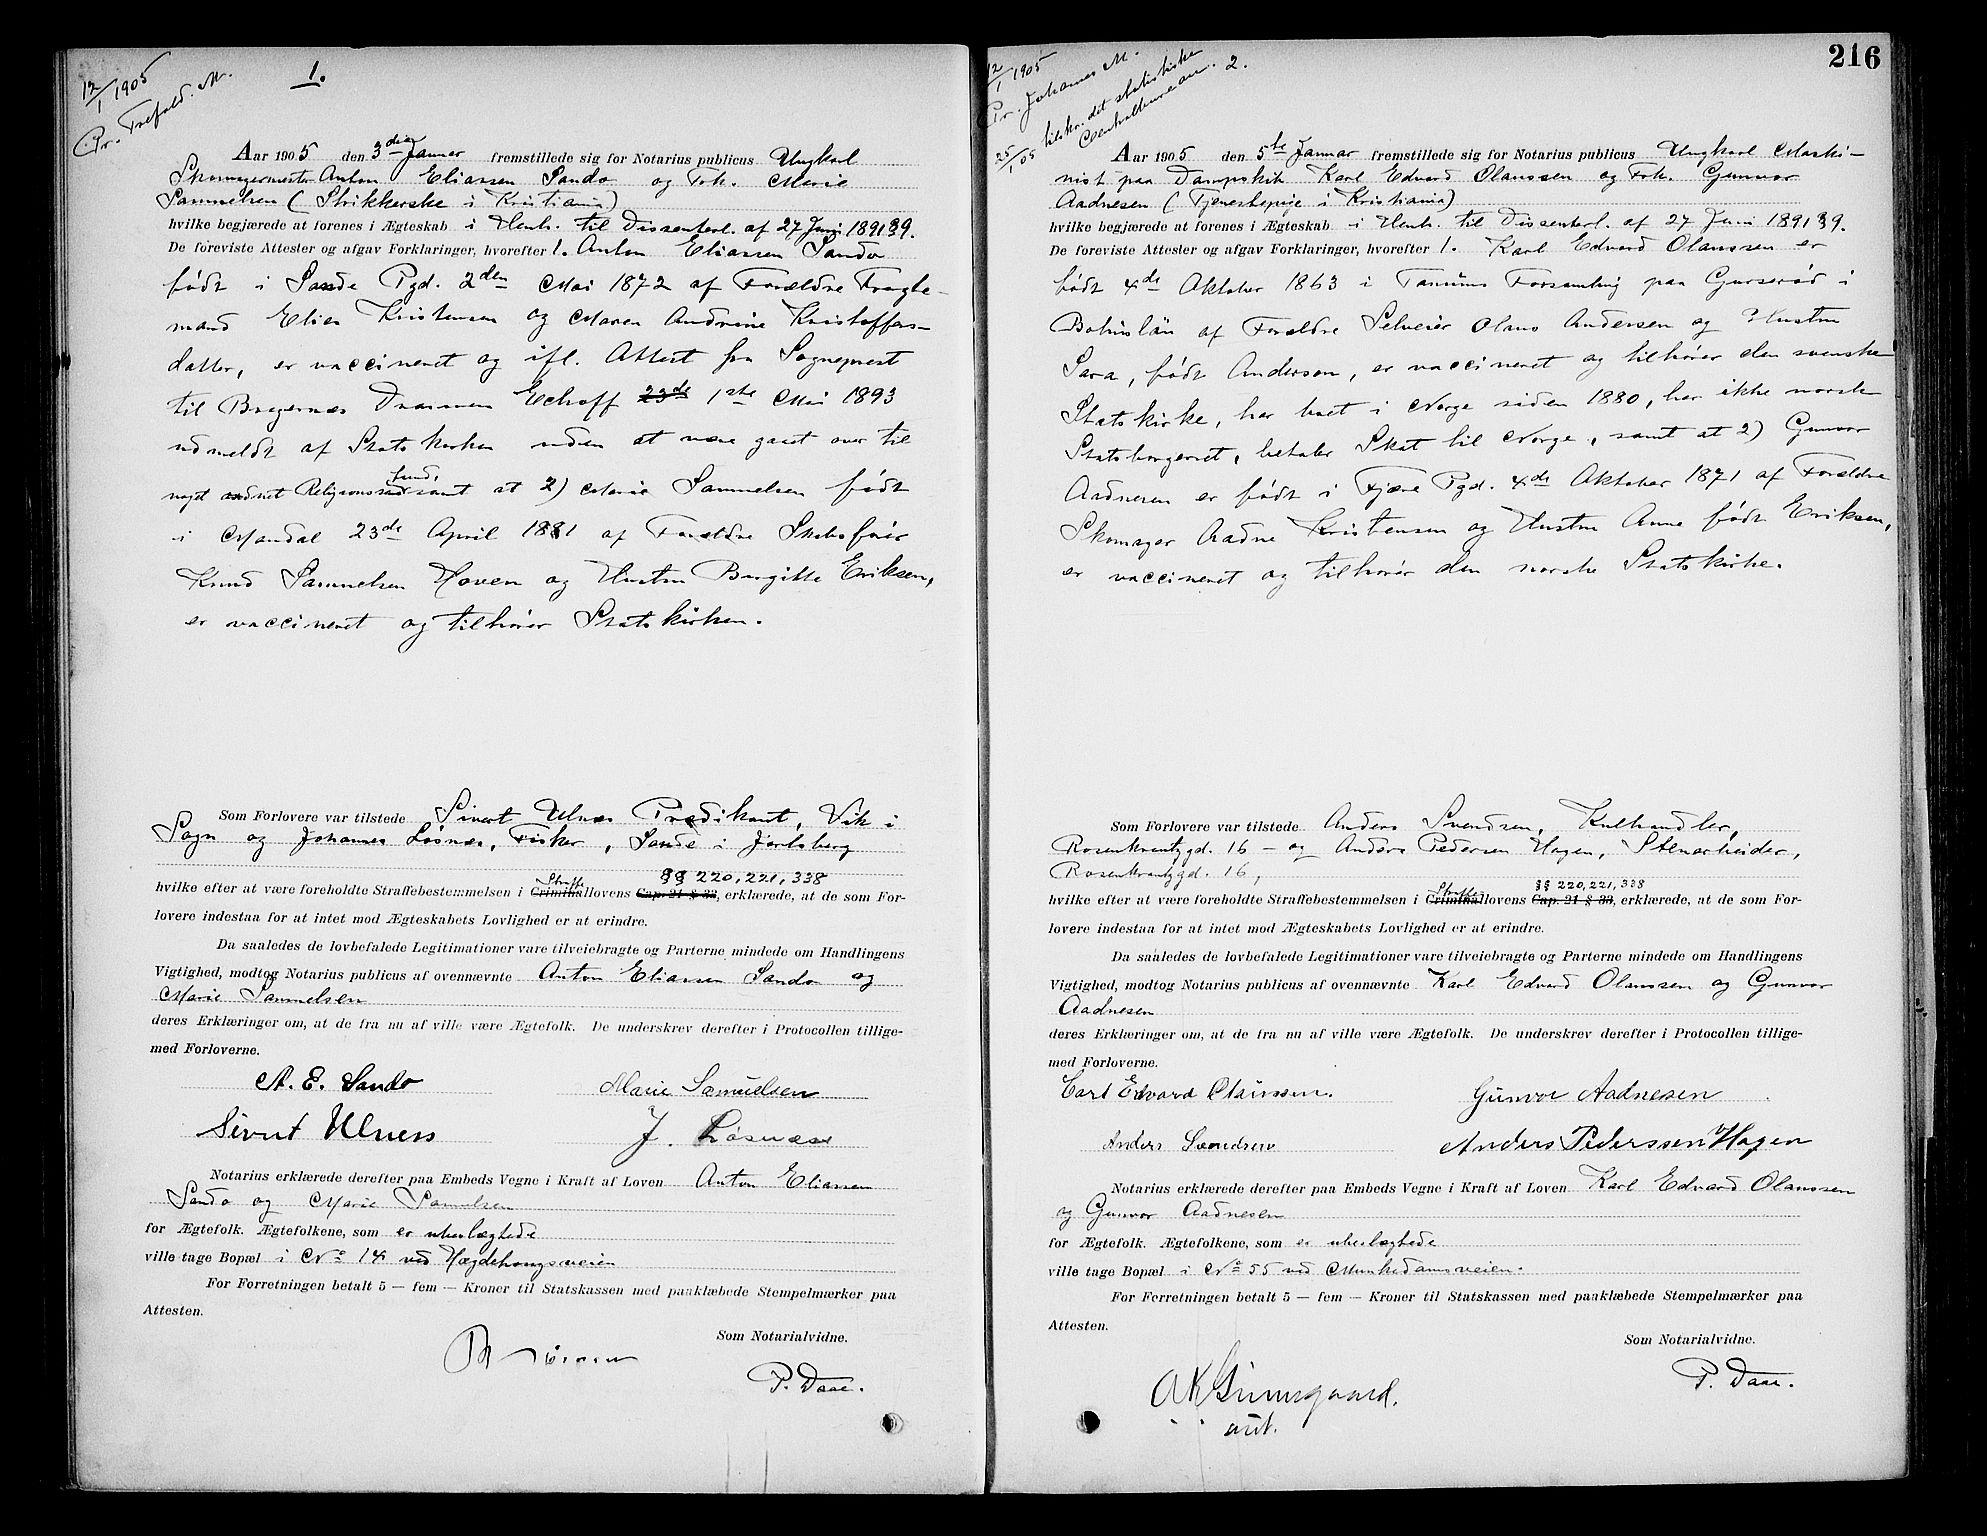 SAO, Oslo byfogd avd. I, L/Lb/Lbb/L0006: Notarialprotokoll, rekke II: Vigsler, 1902-1907, s. 215b-216a